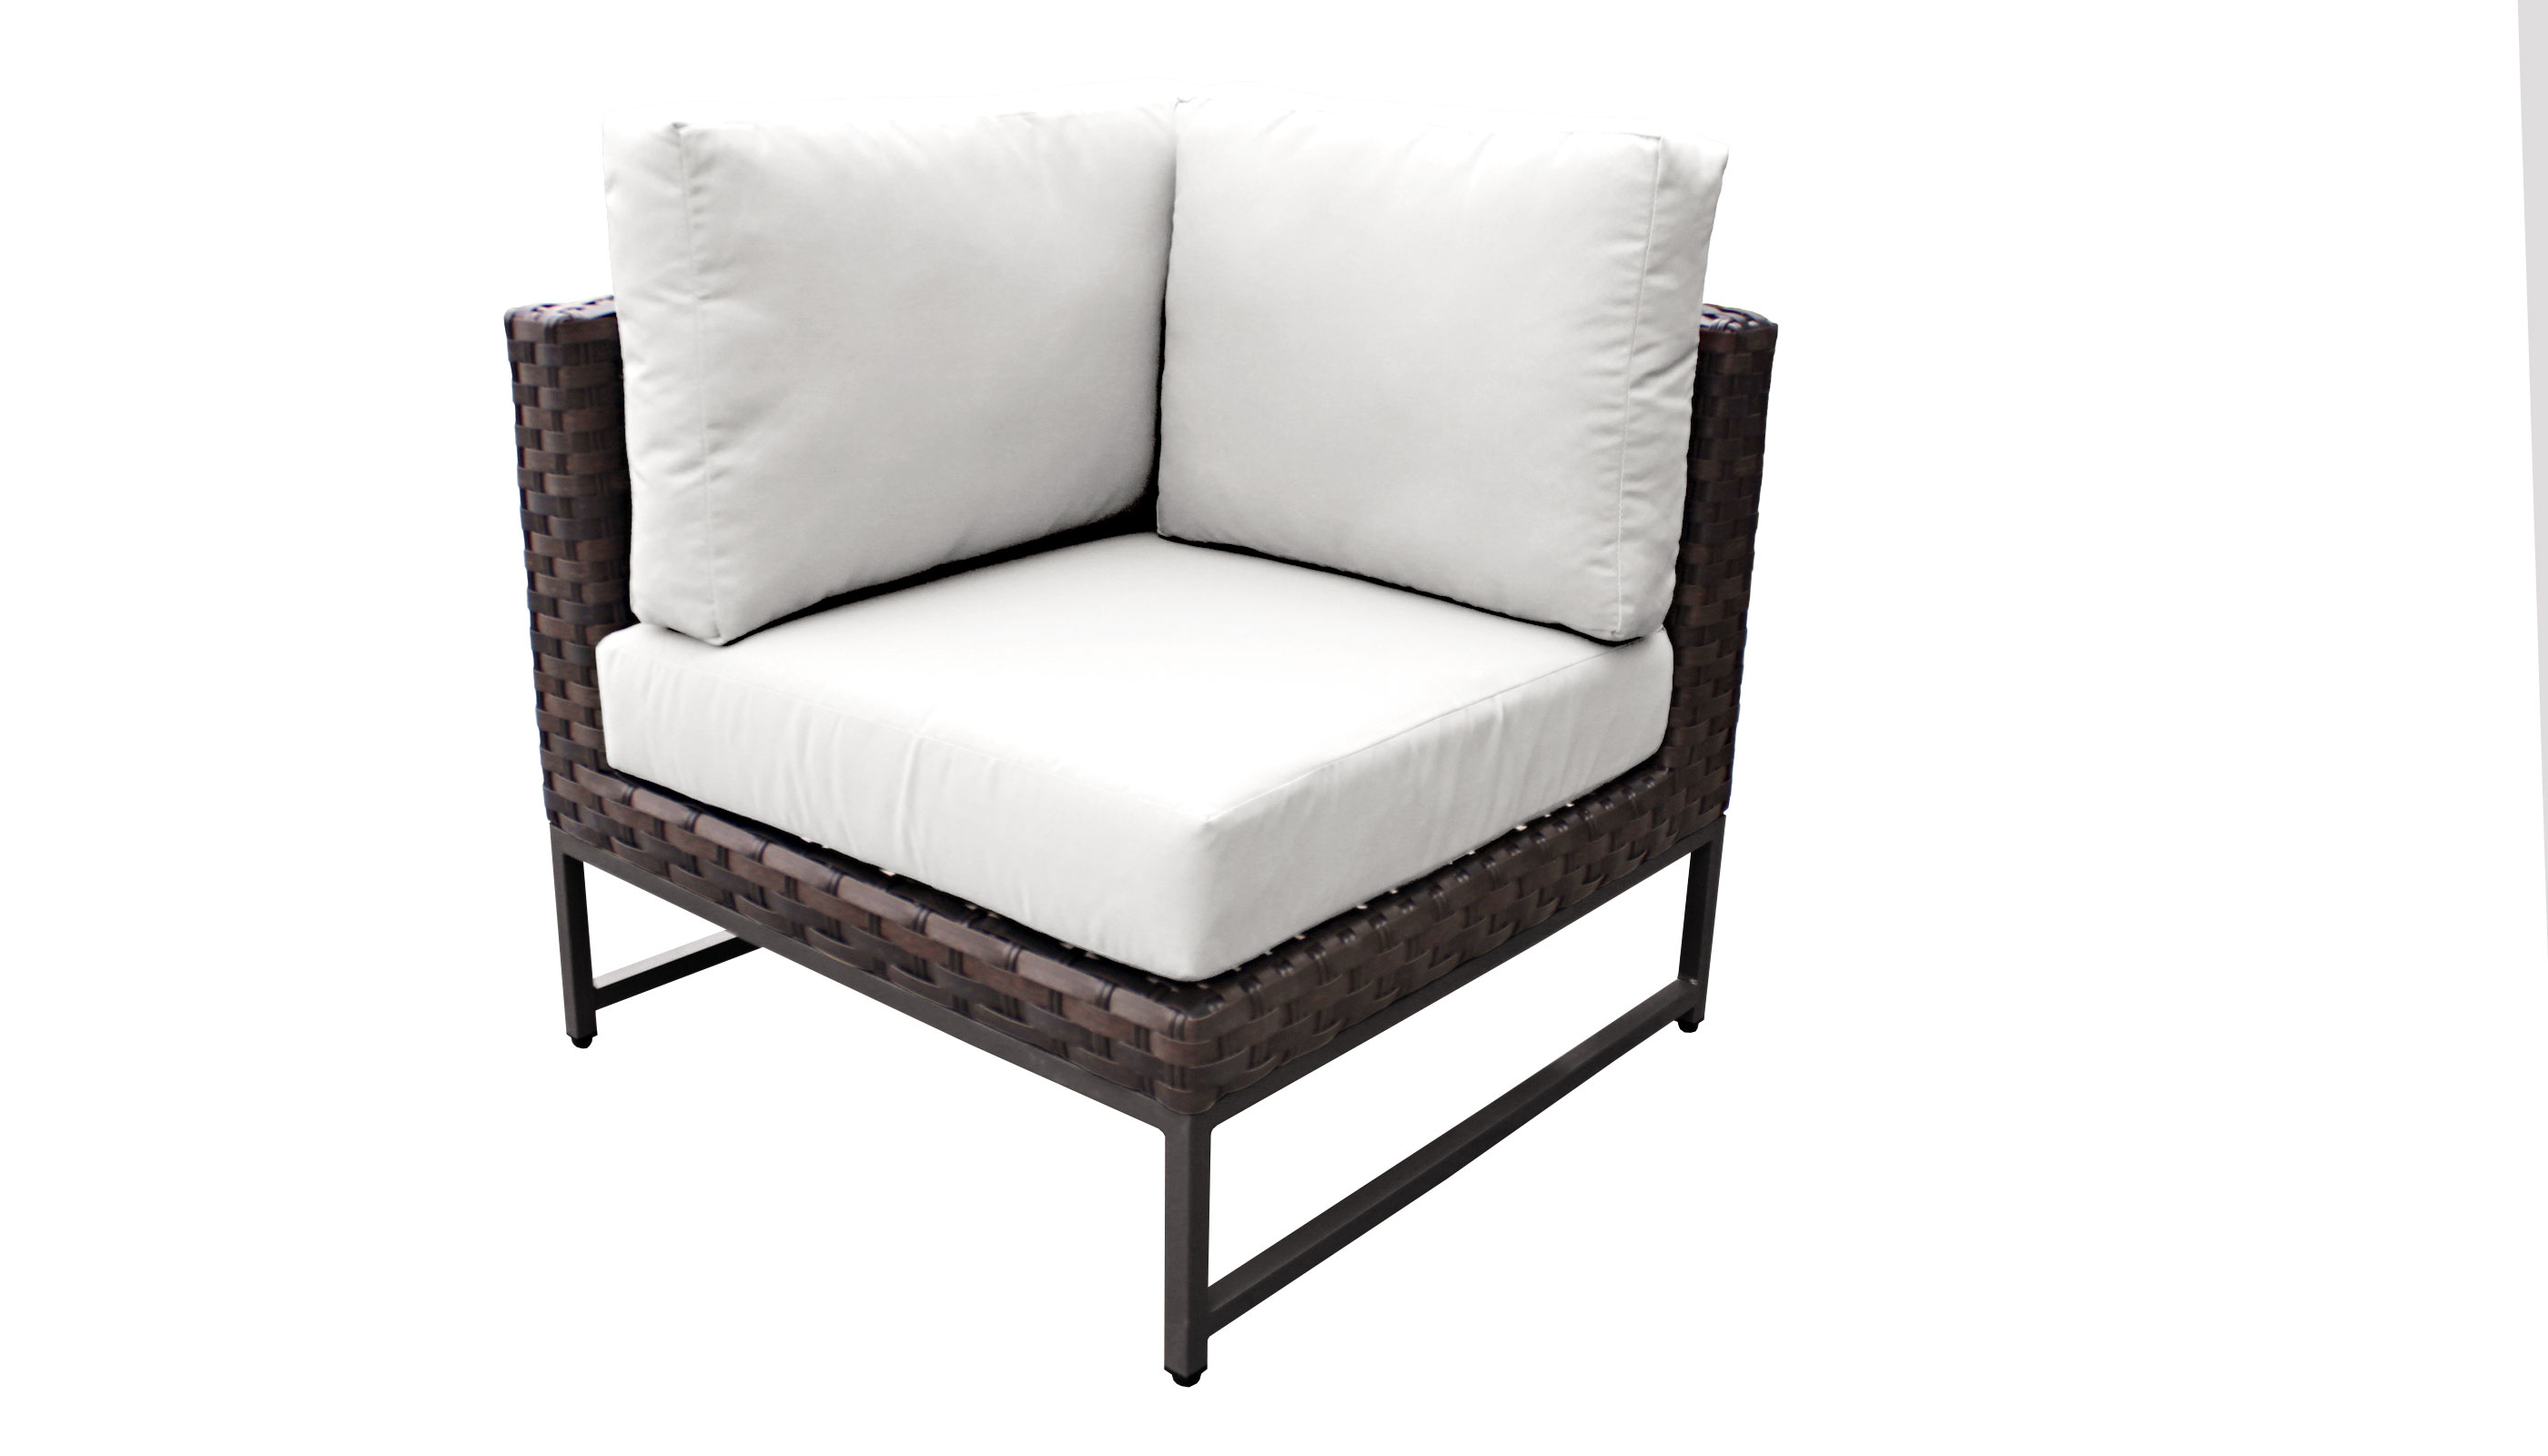 Barcelona 3 Piece Outdoor Wicker Patio Furniture Set 03c - TK Classics